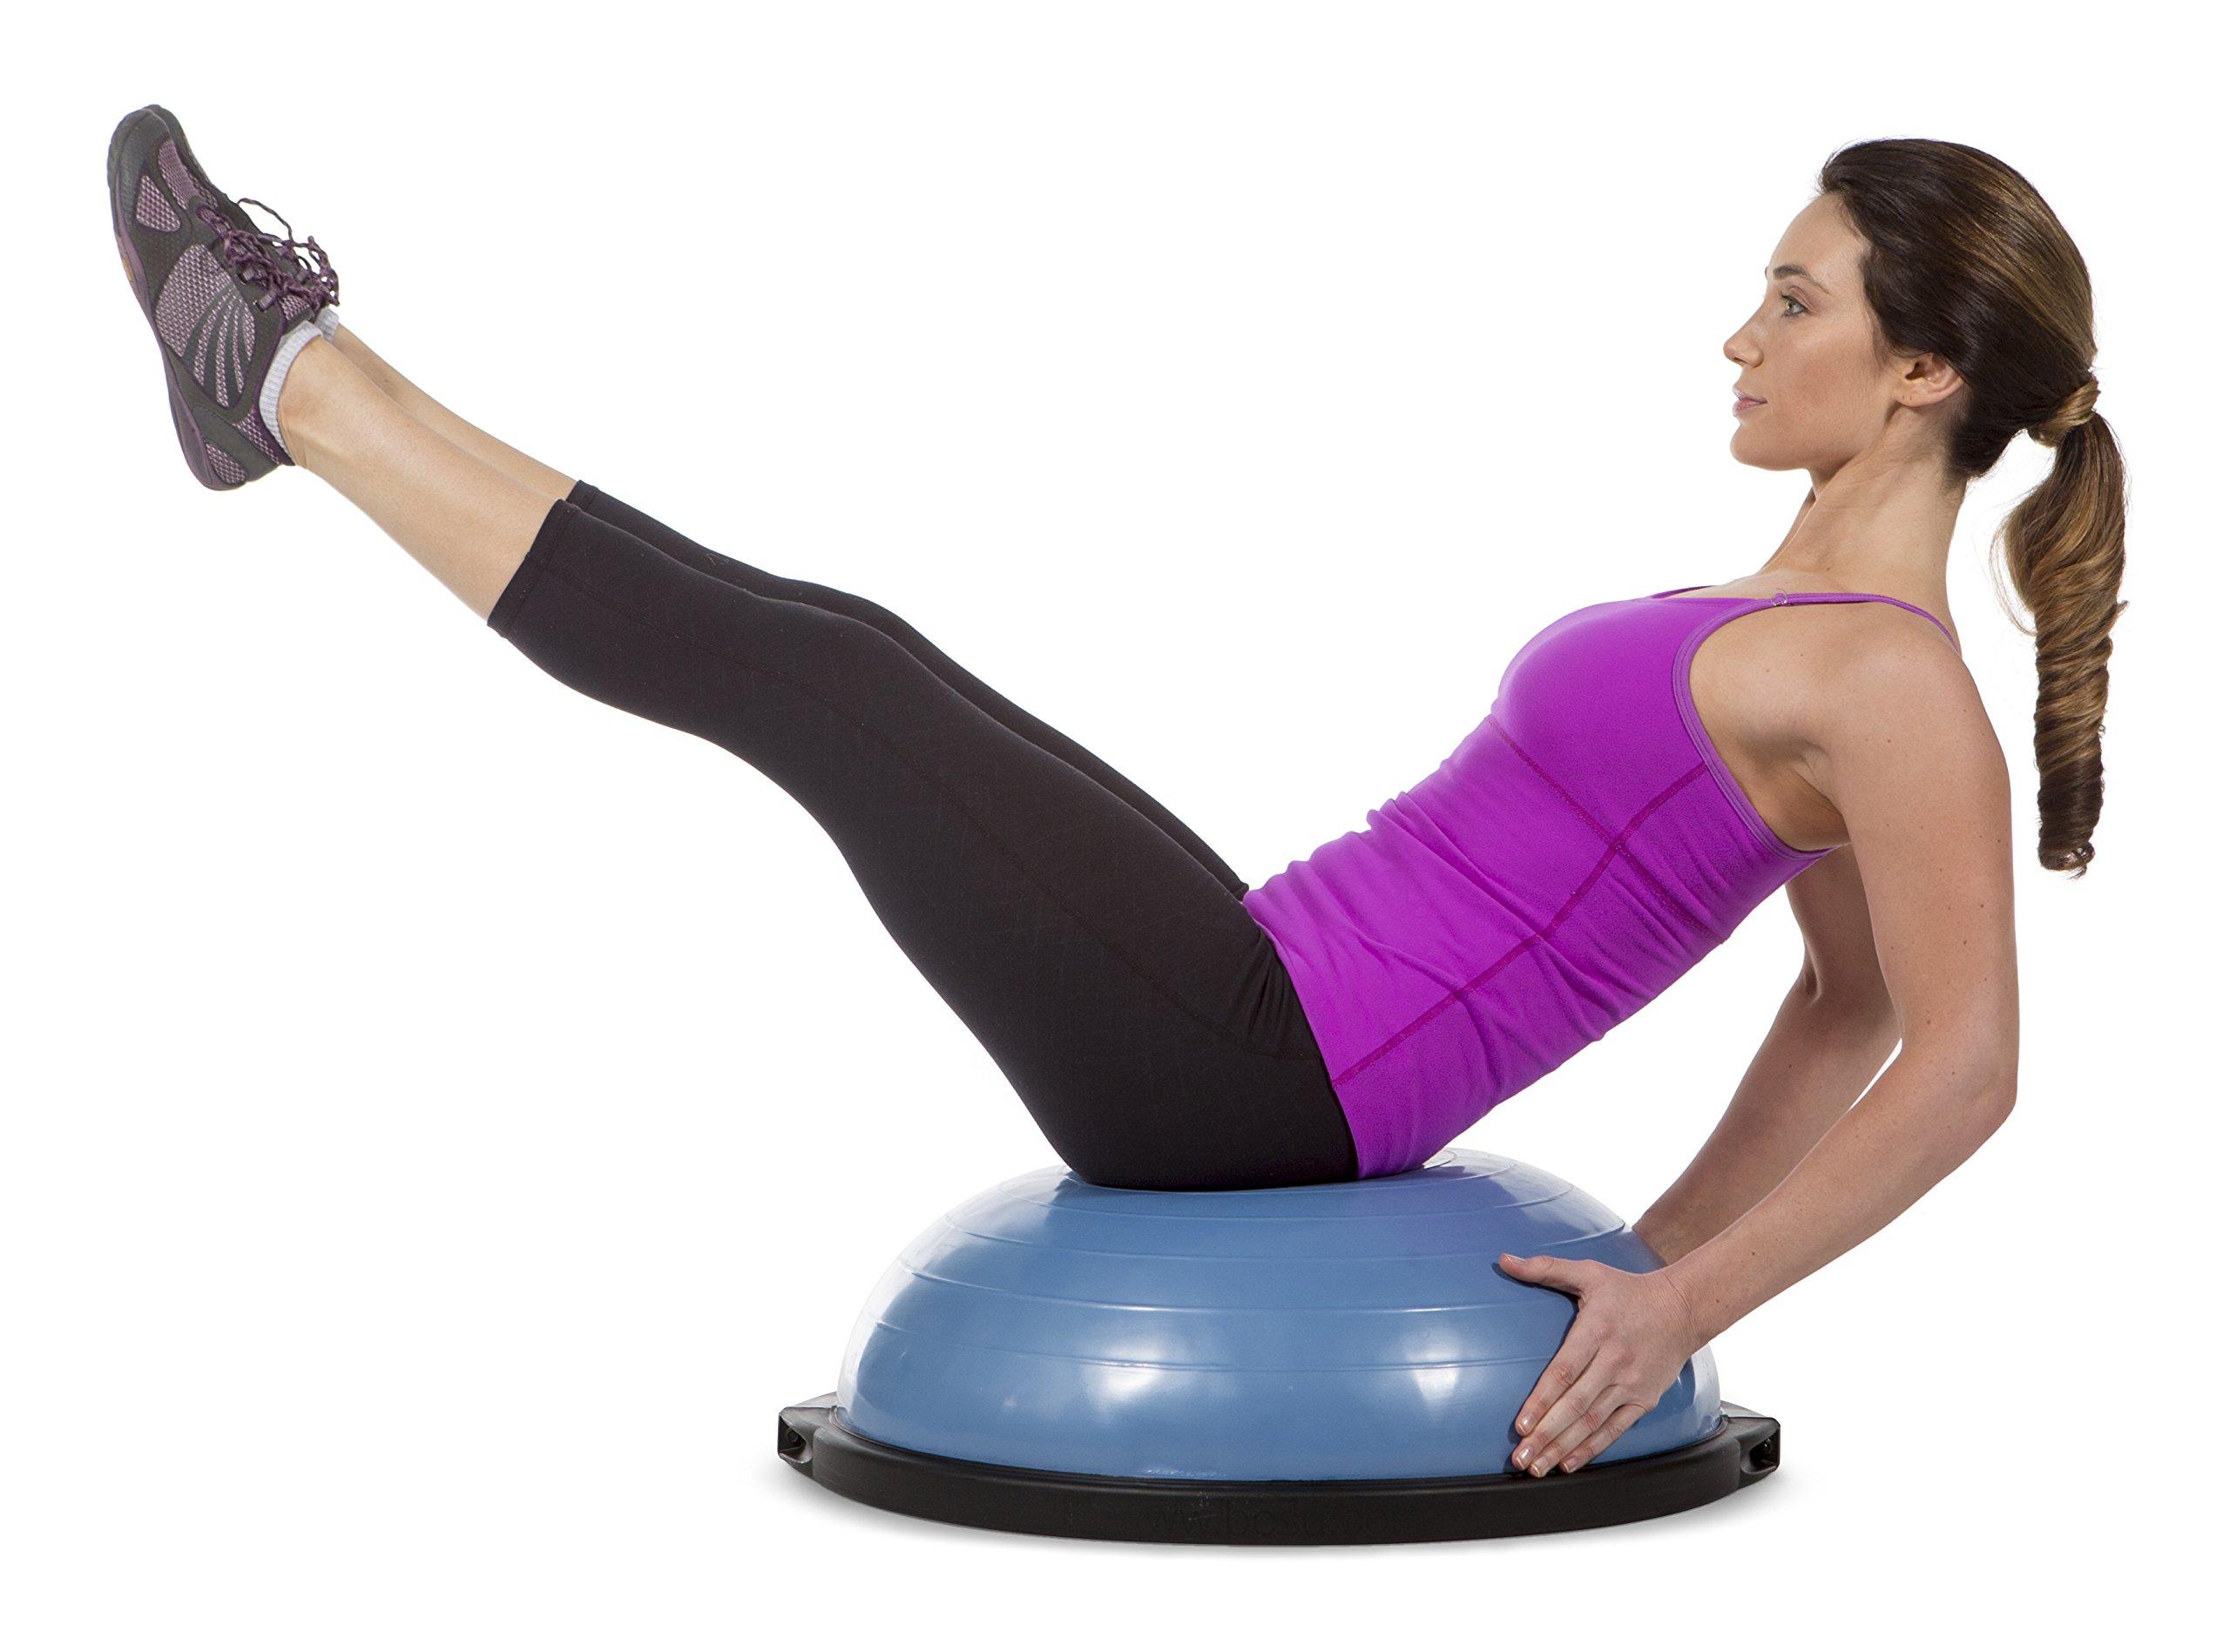 Bosu Balance Trainer, 65cm The Original - Blue/Green by Bosu (Image #4)